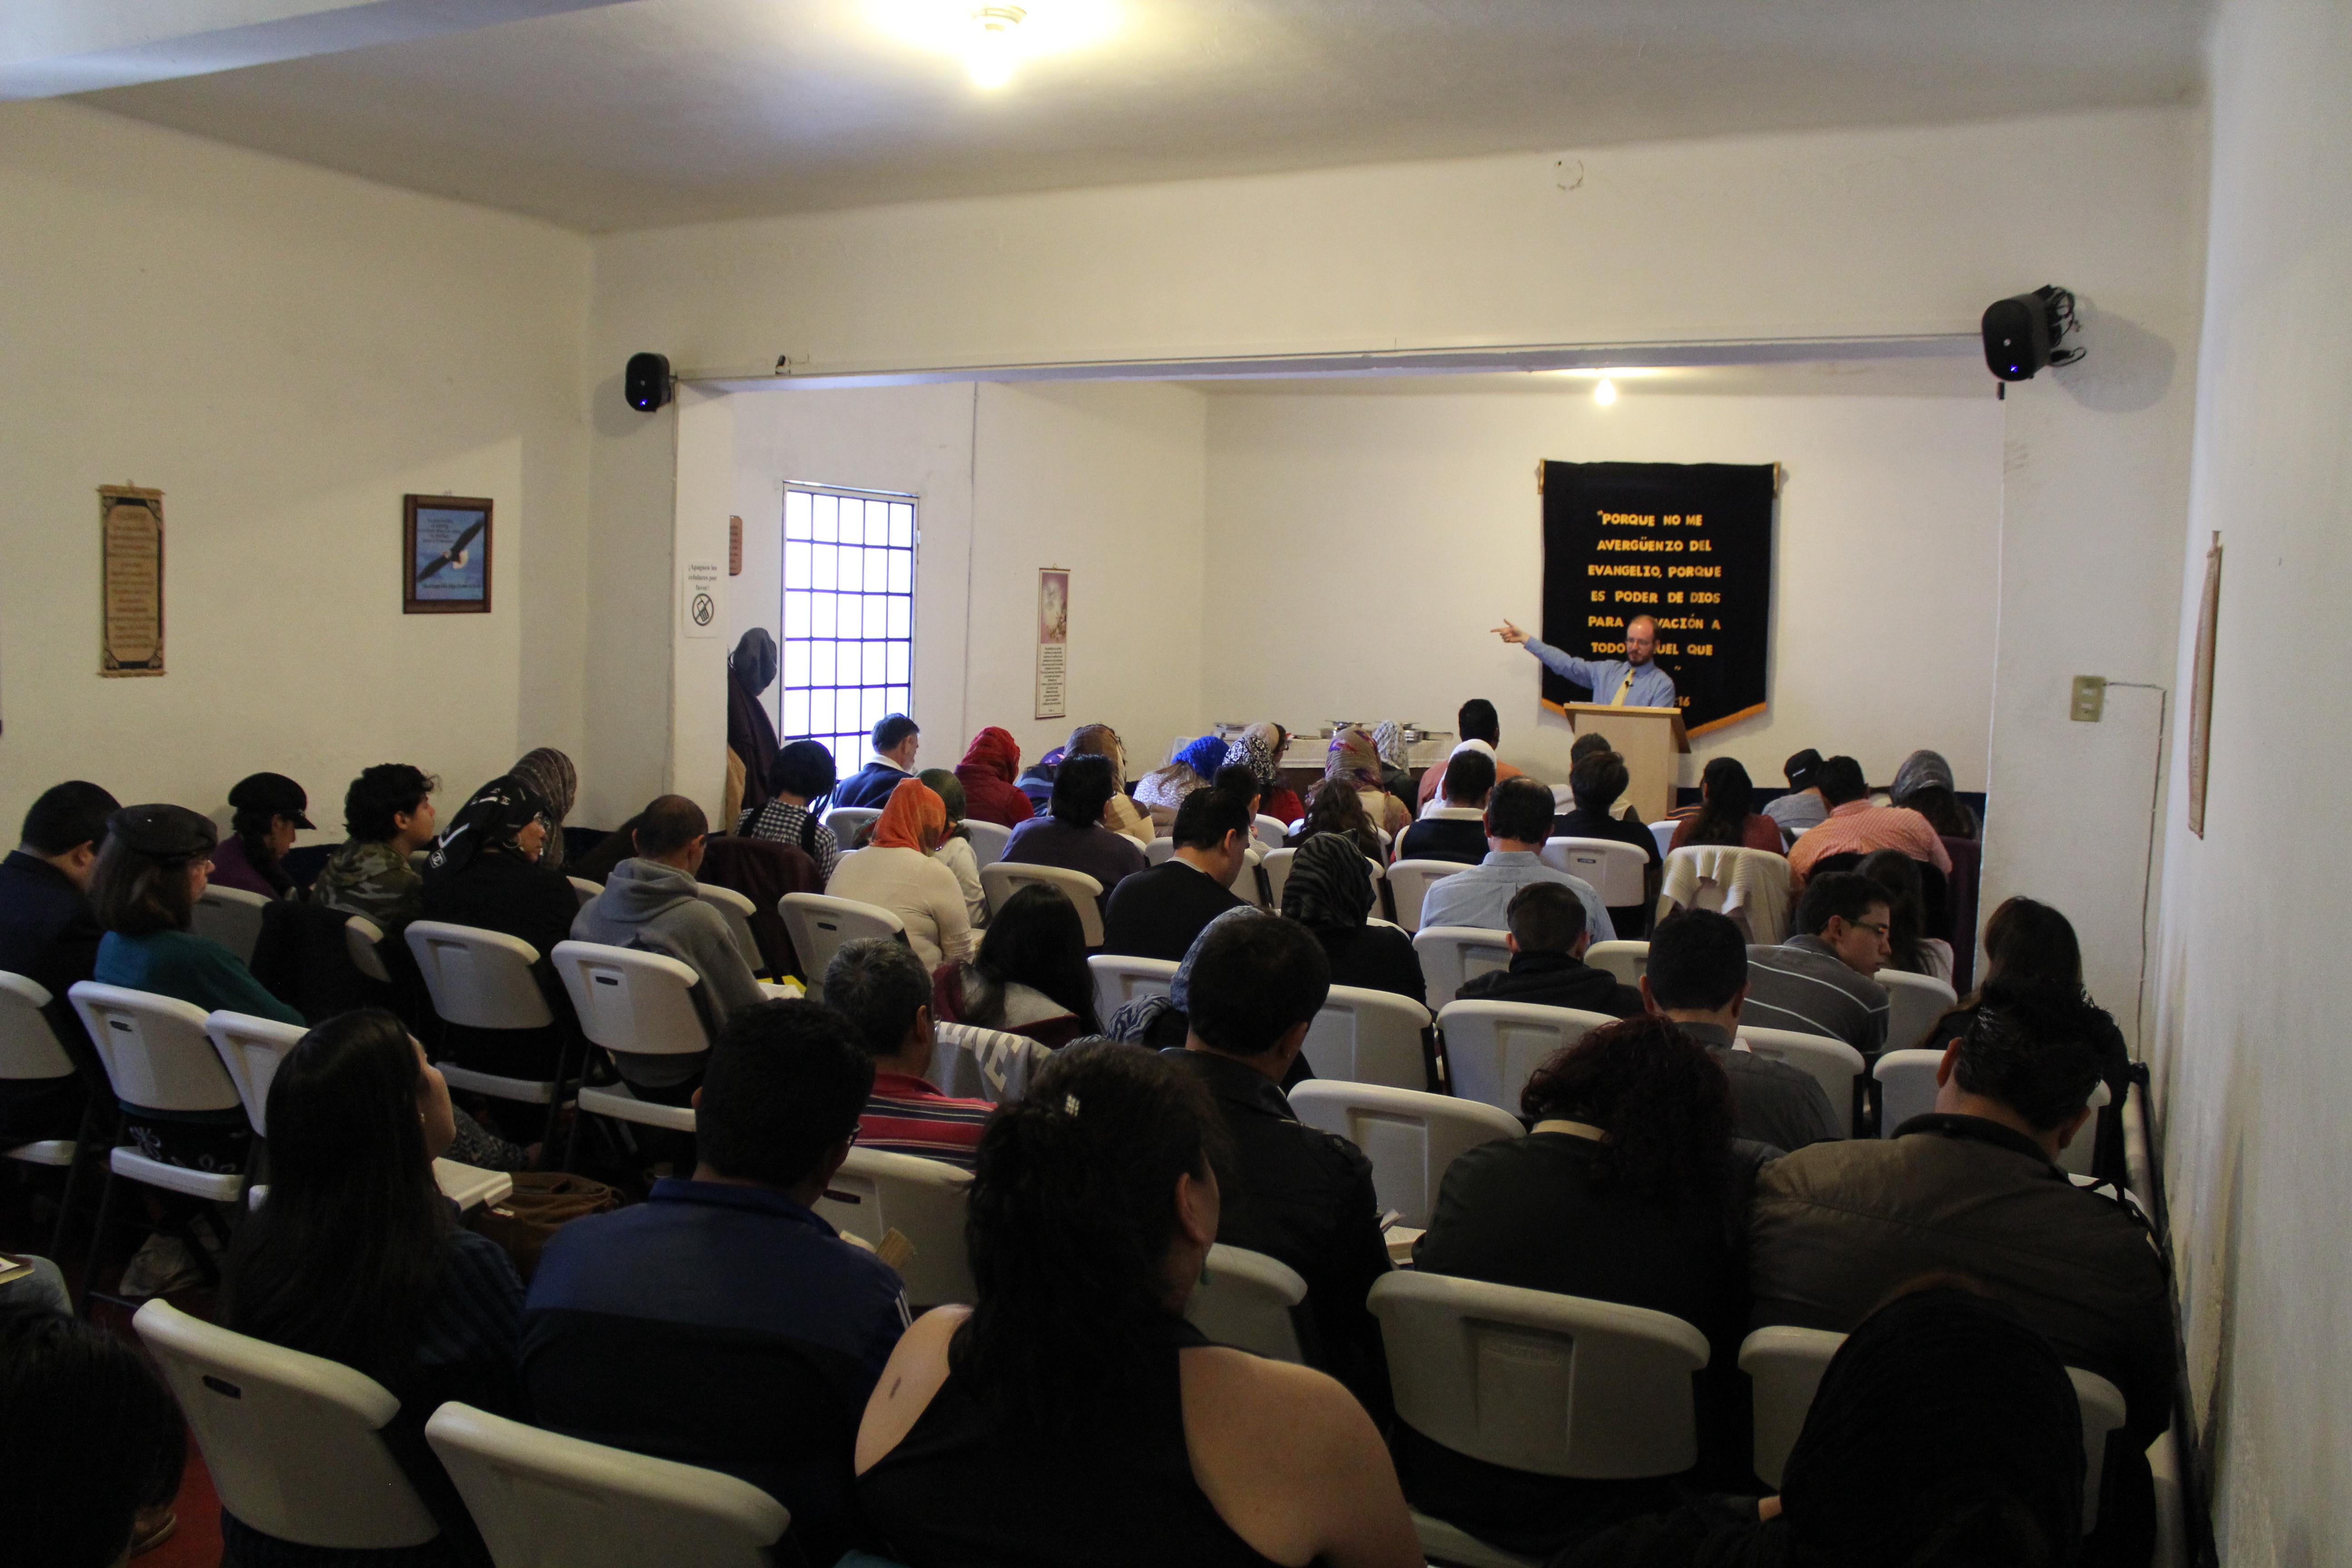 IMG_4901- Sunday service